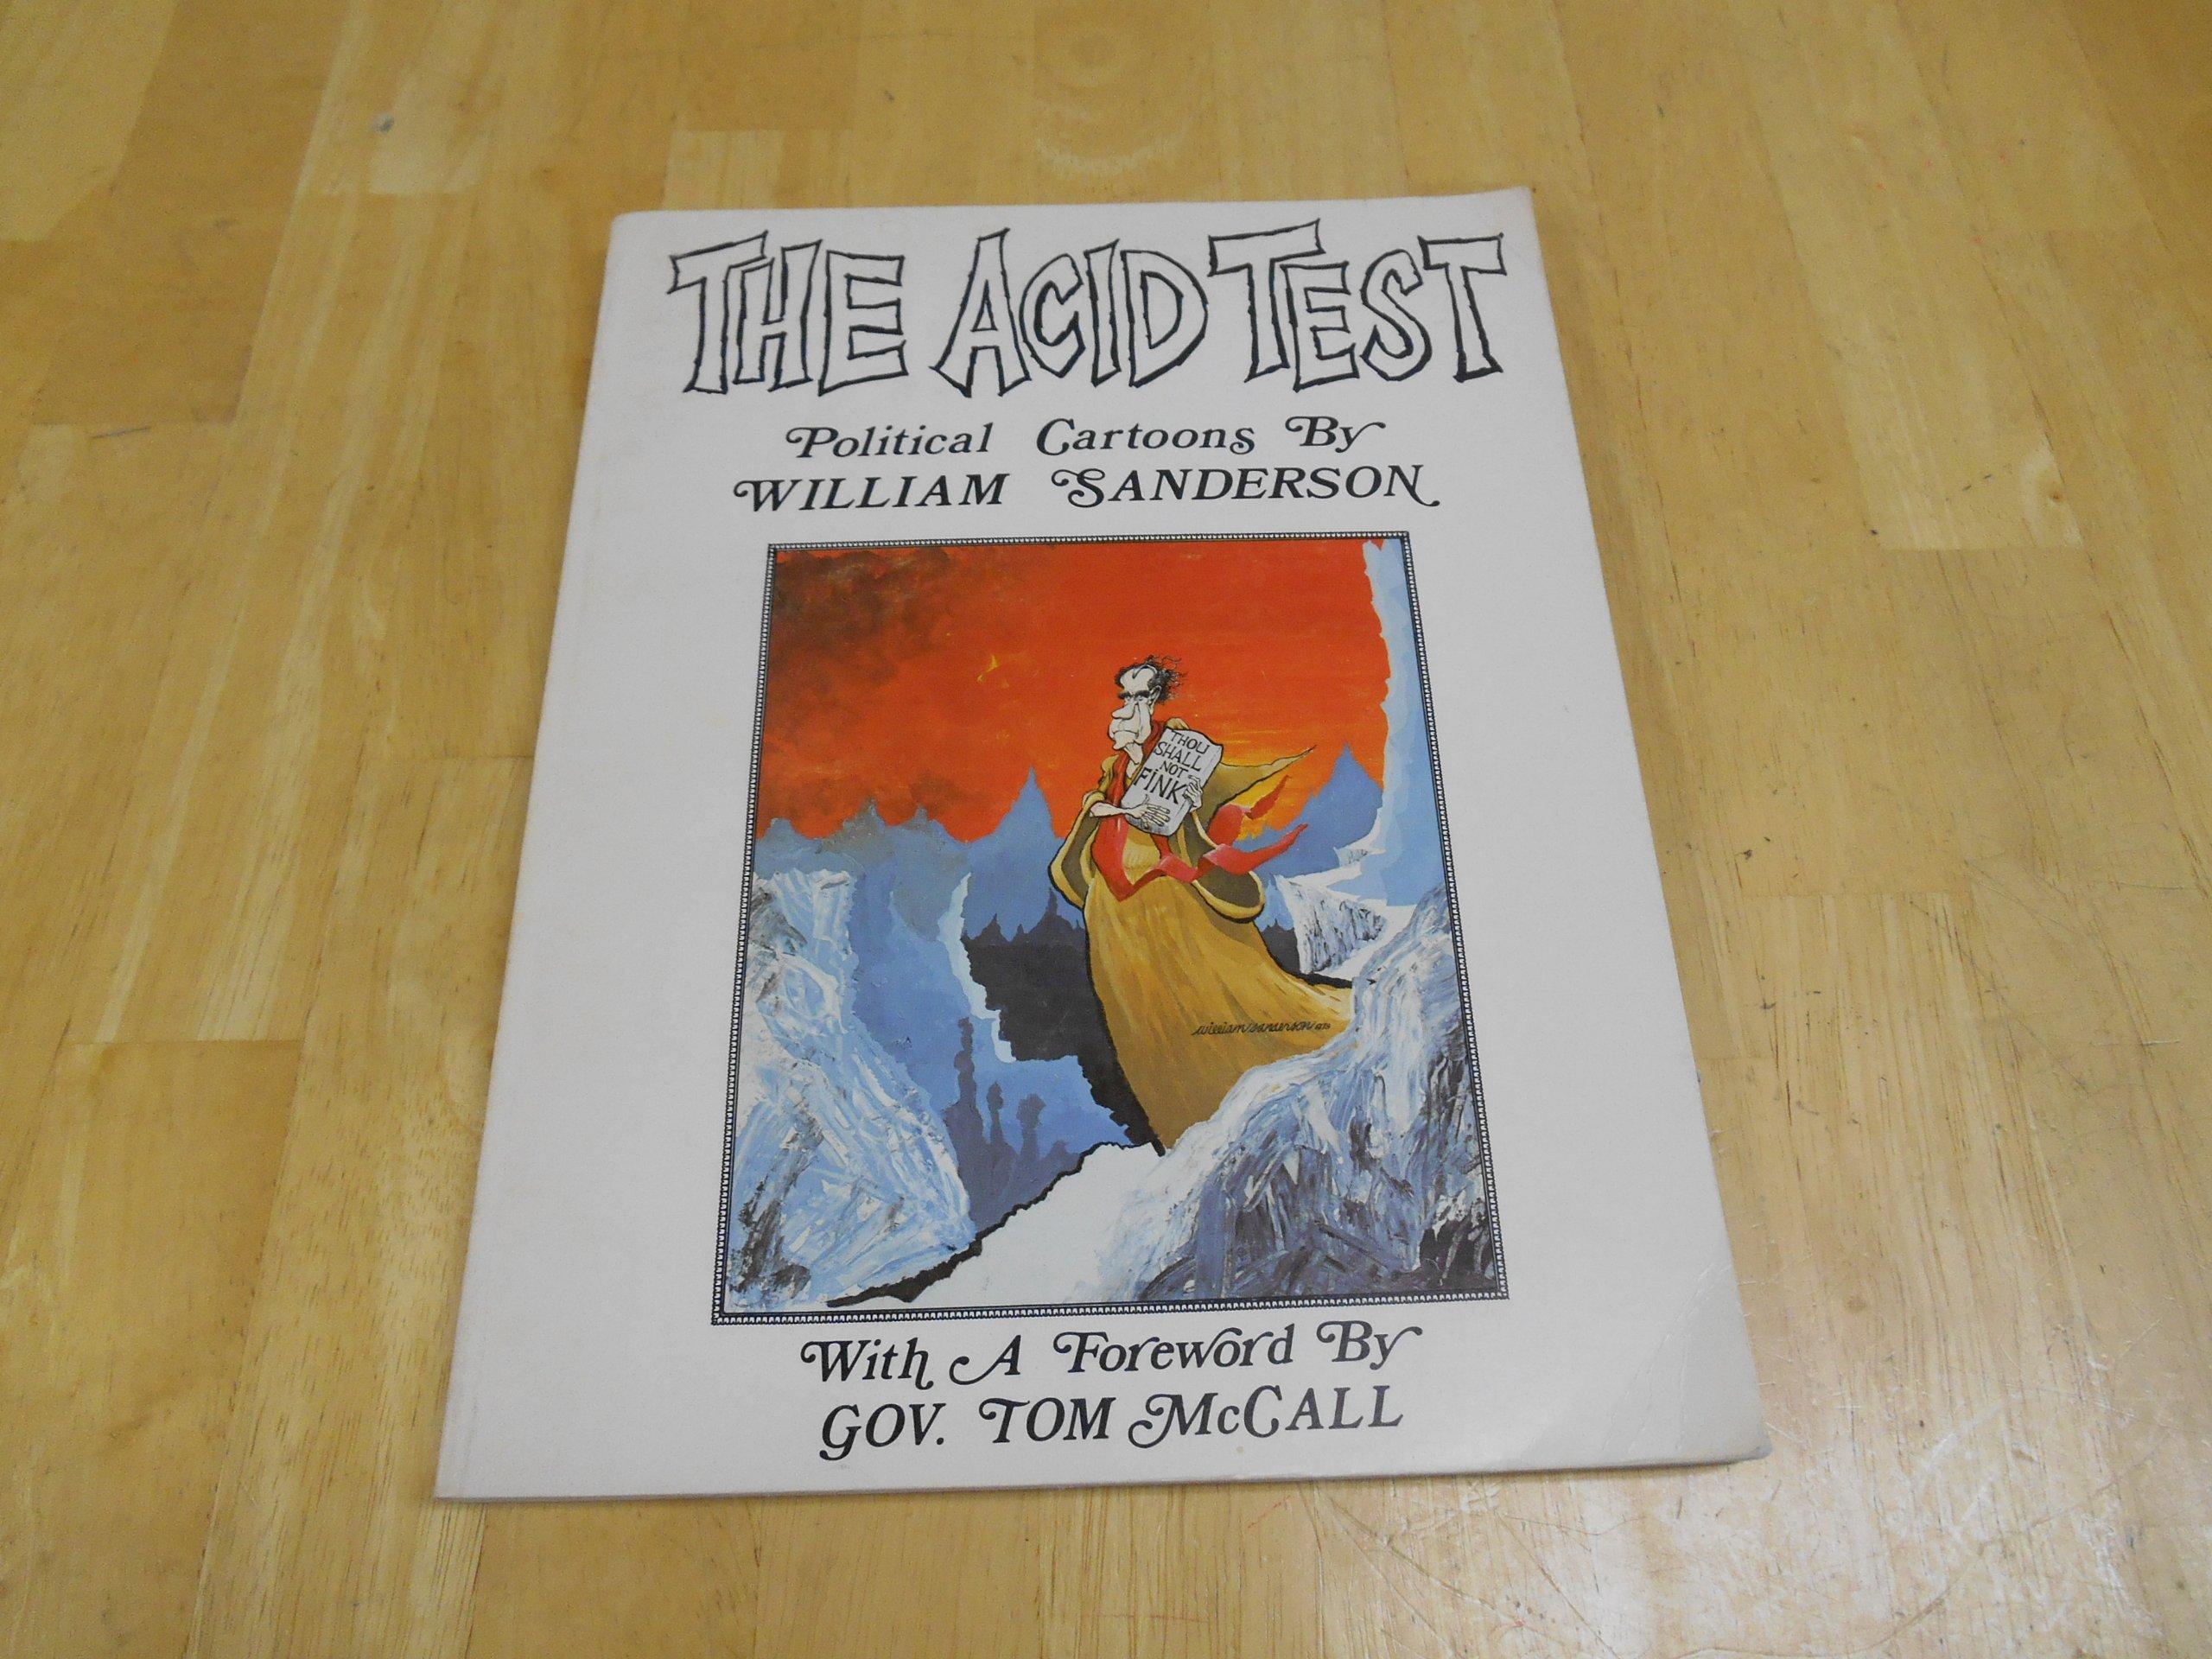 The Acid Test Political Cartoons, Sanderson, William